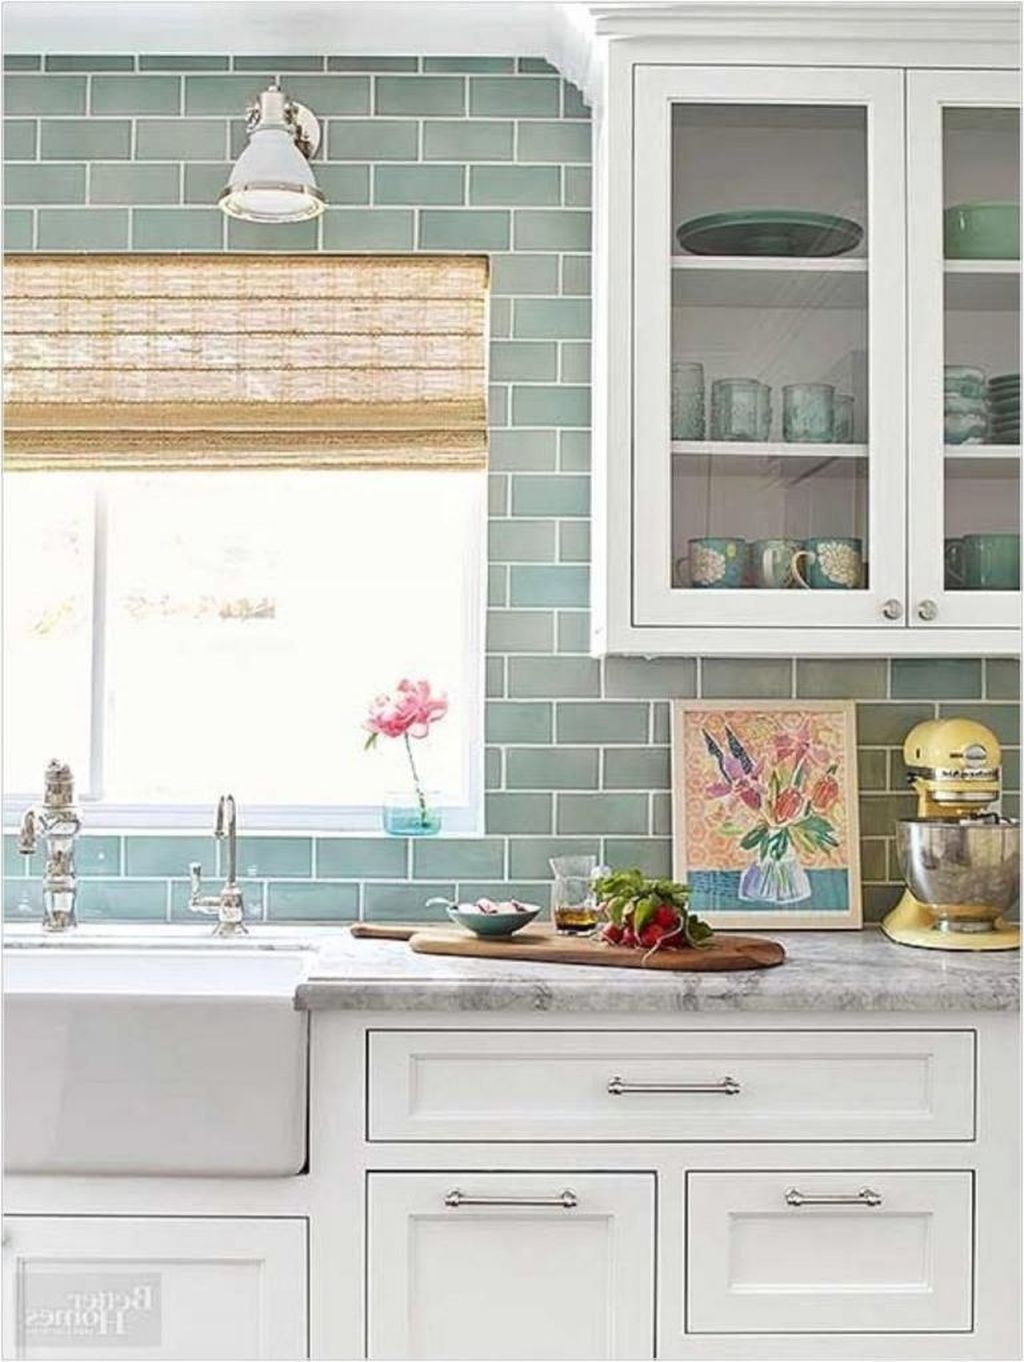 32 Popular Modern Farmhouse Kitchen Backsplash Ideas Modern Farmhouse Kitchens Farmhouse Kitchen Backsplash Kitchen Remodel